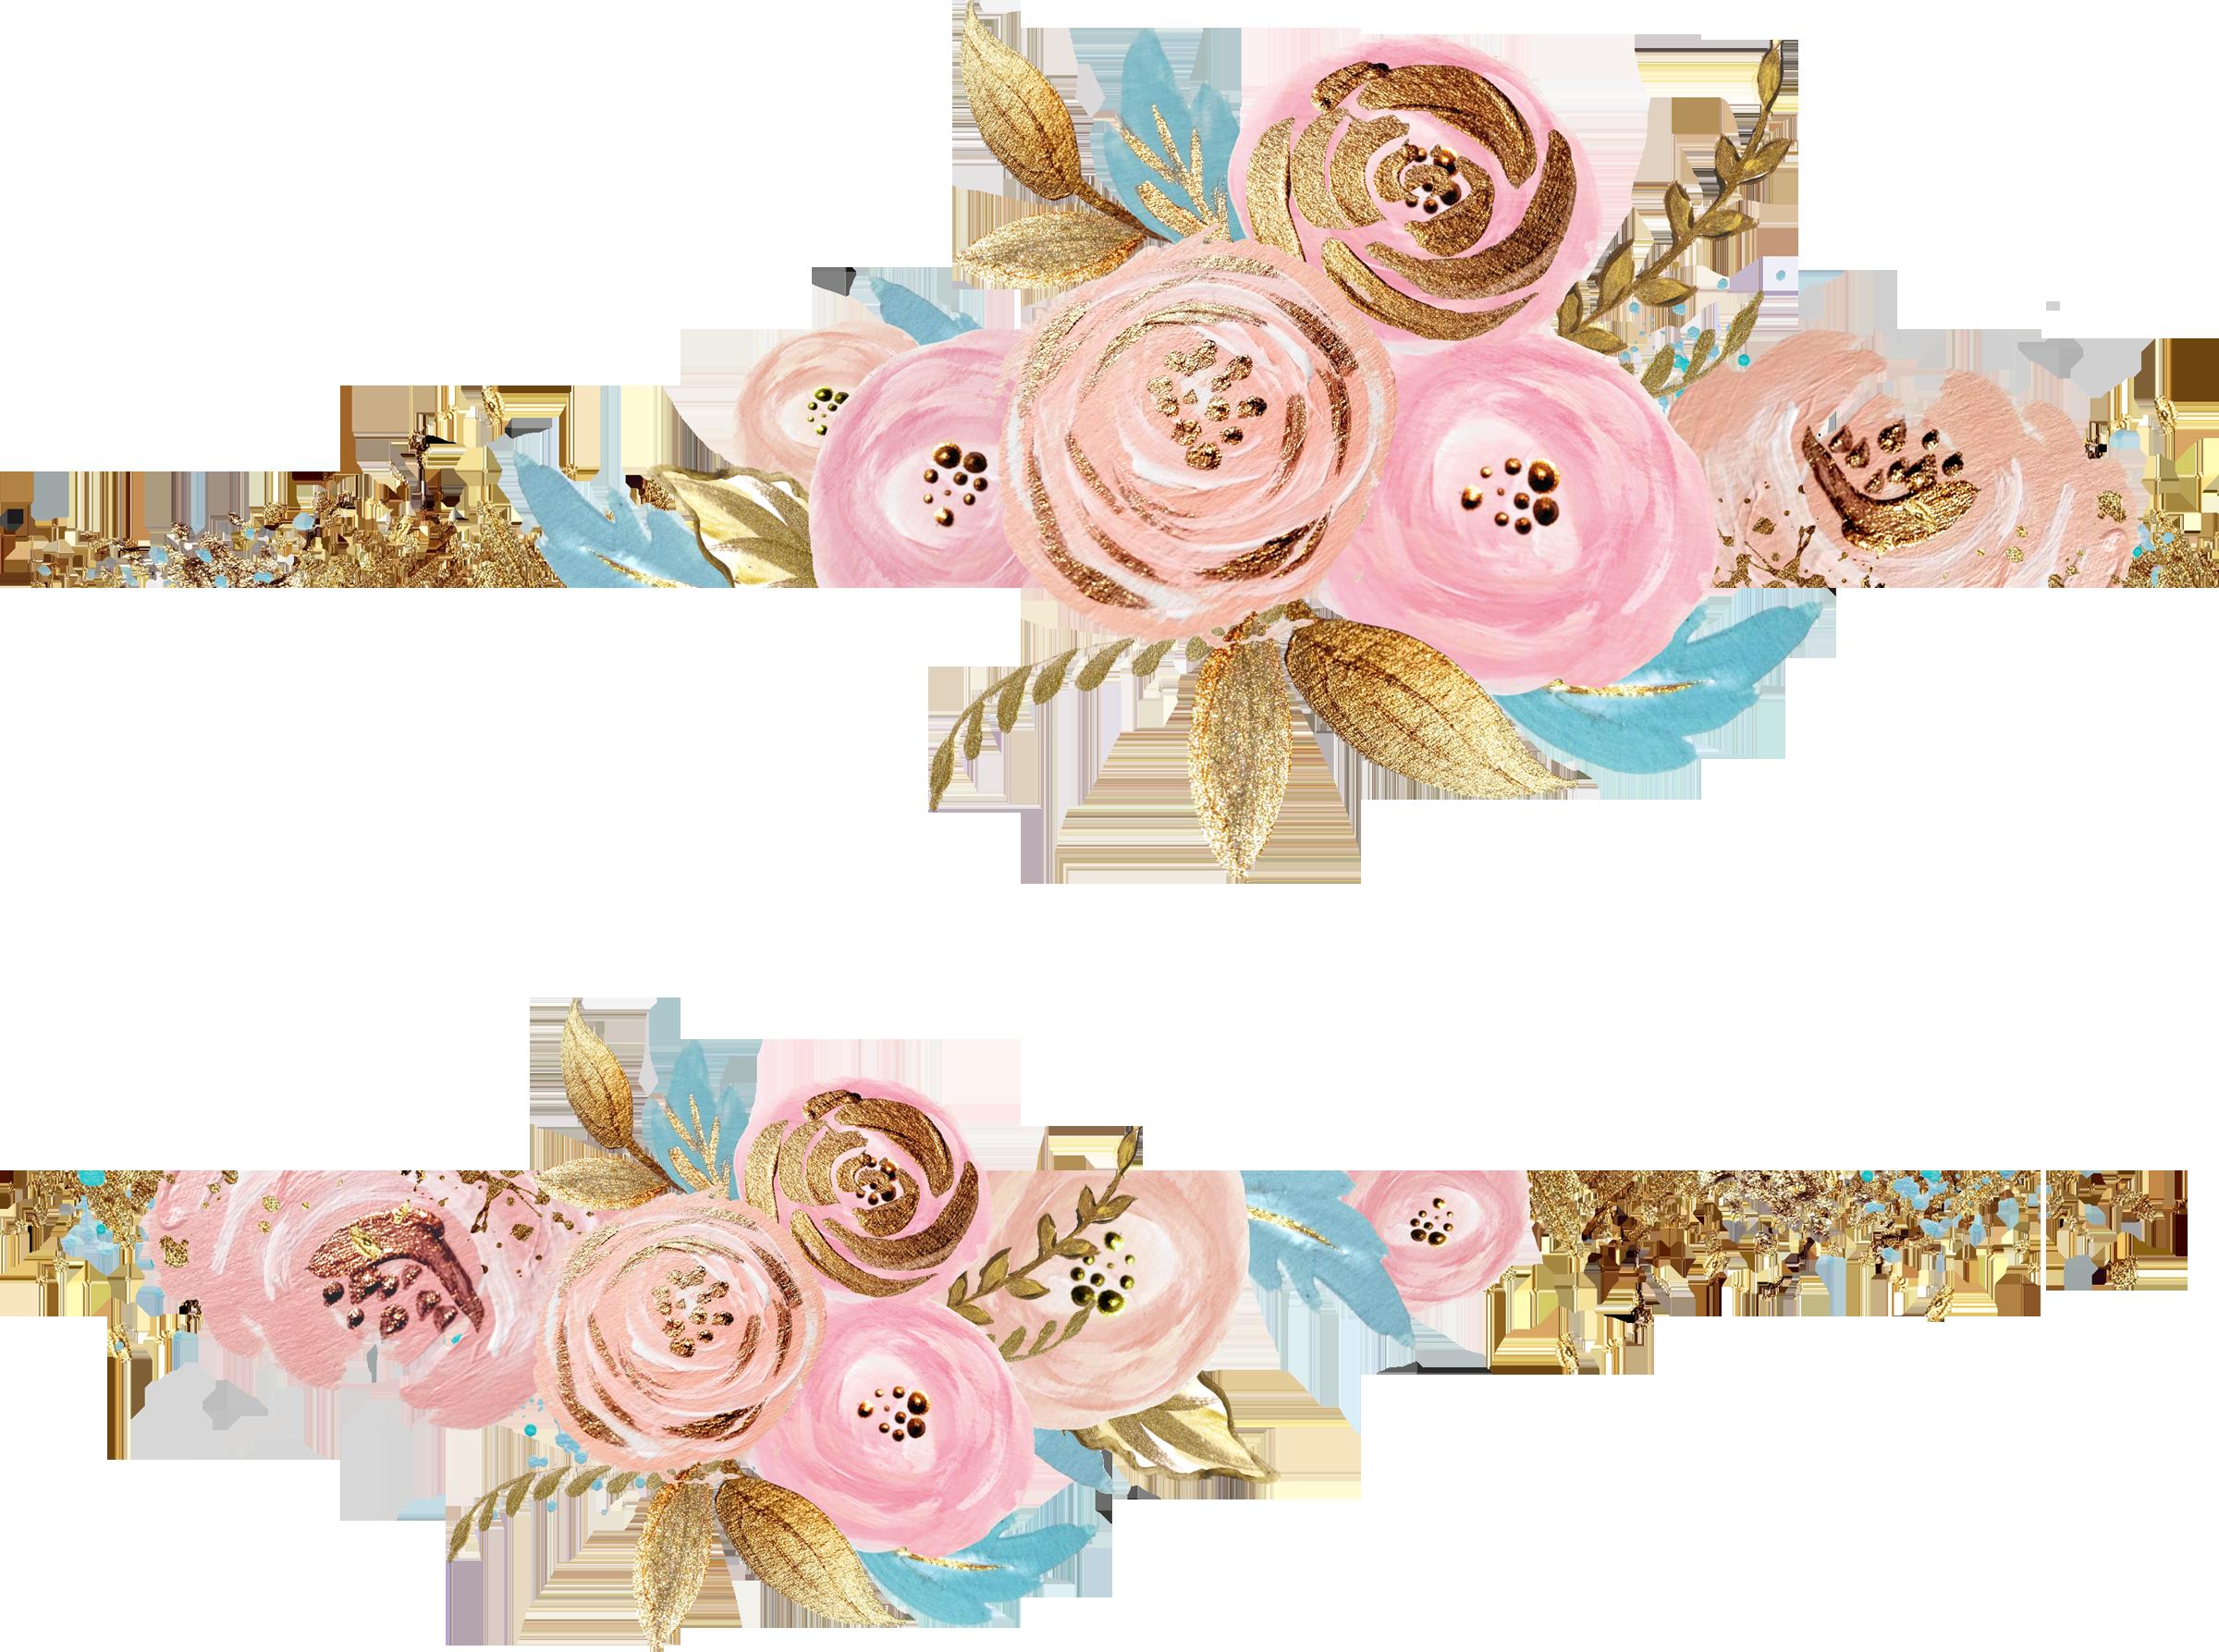 Flower clipart boho clip royalty free library pion174.png 2 400×1 787 пикс | Идеи для дней рождения | Pinterest ... clip royalty free library